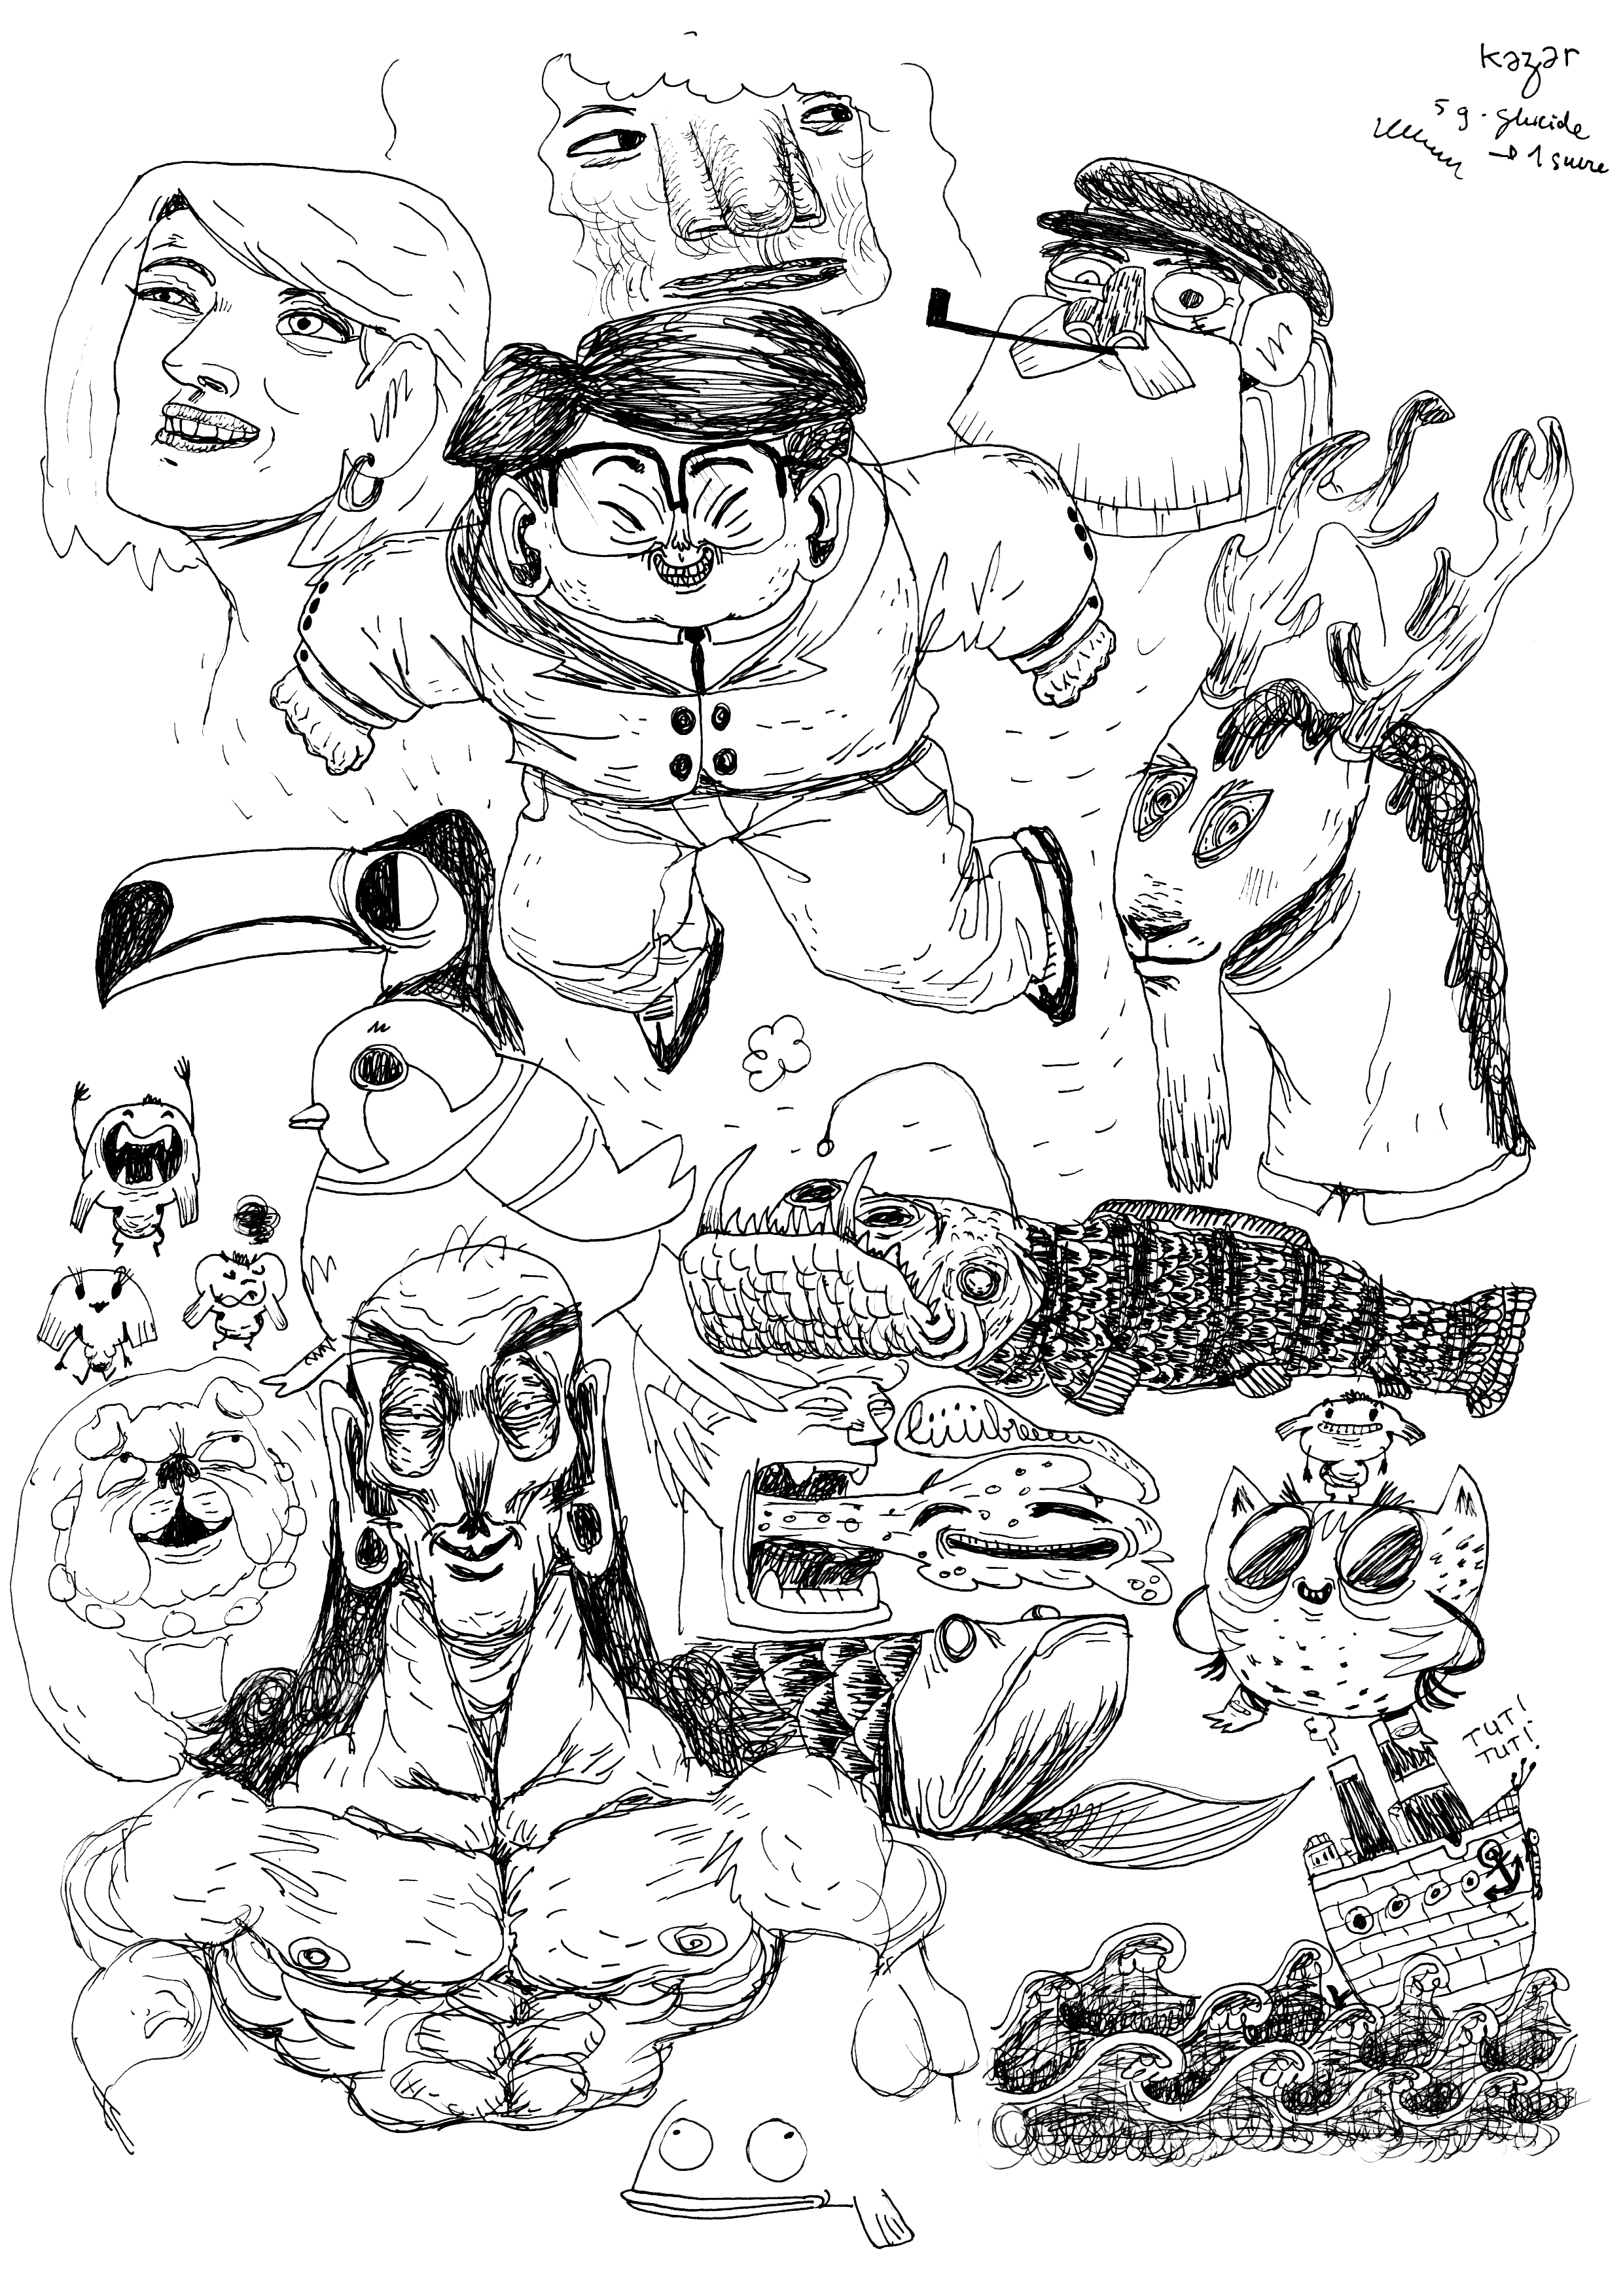 Pascal_Zaffiro_Doodle_32.jpg